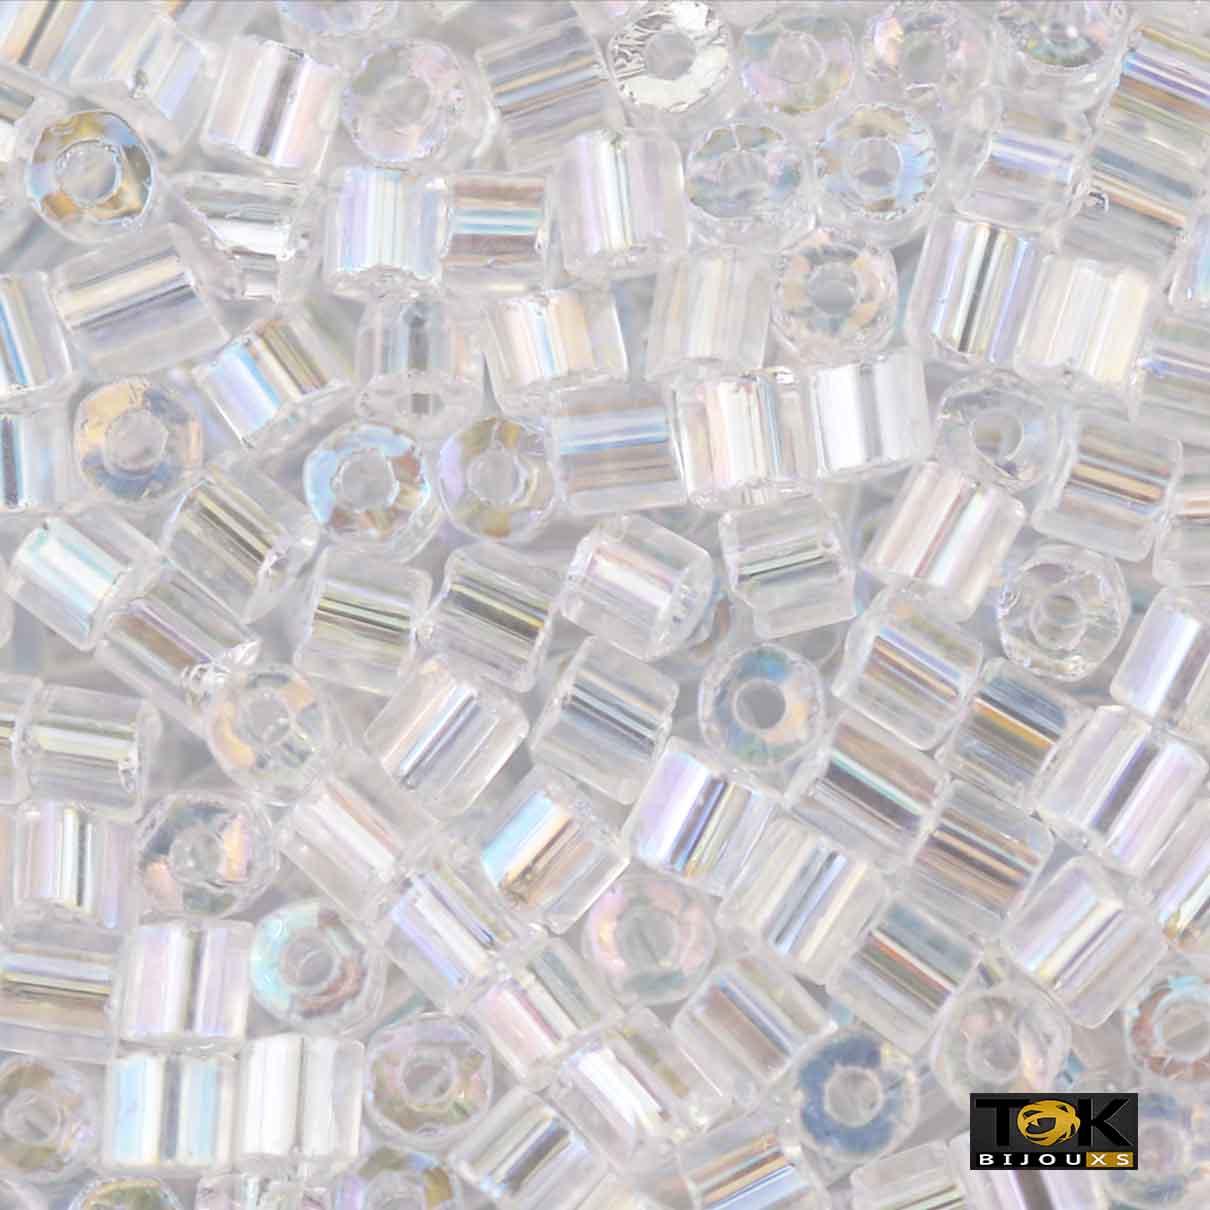 Vidrilho Jablonex - Transparente Irisado - 500g